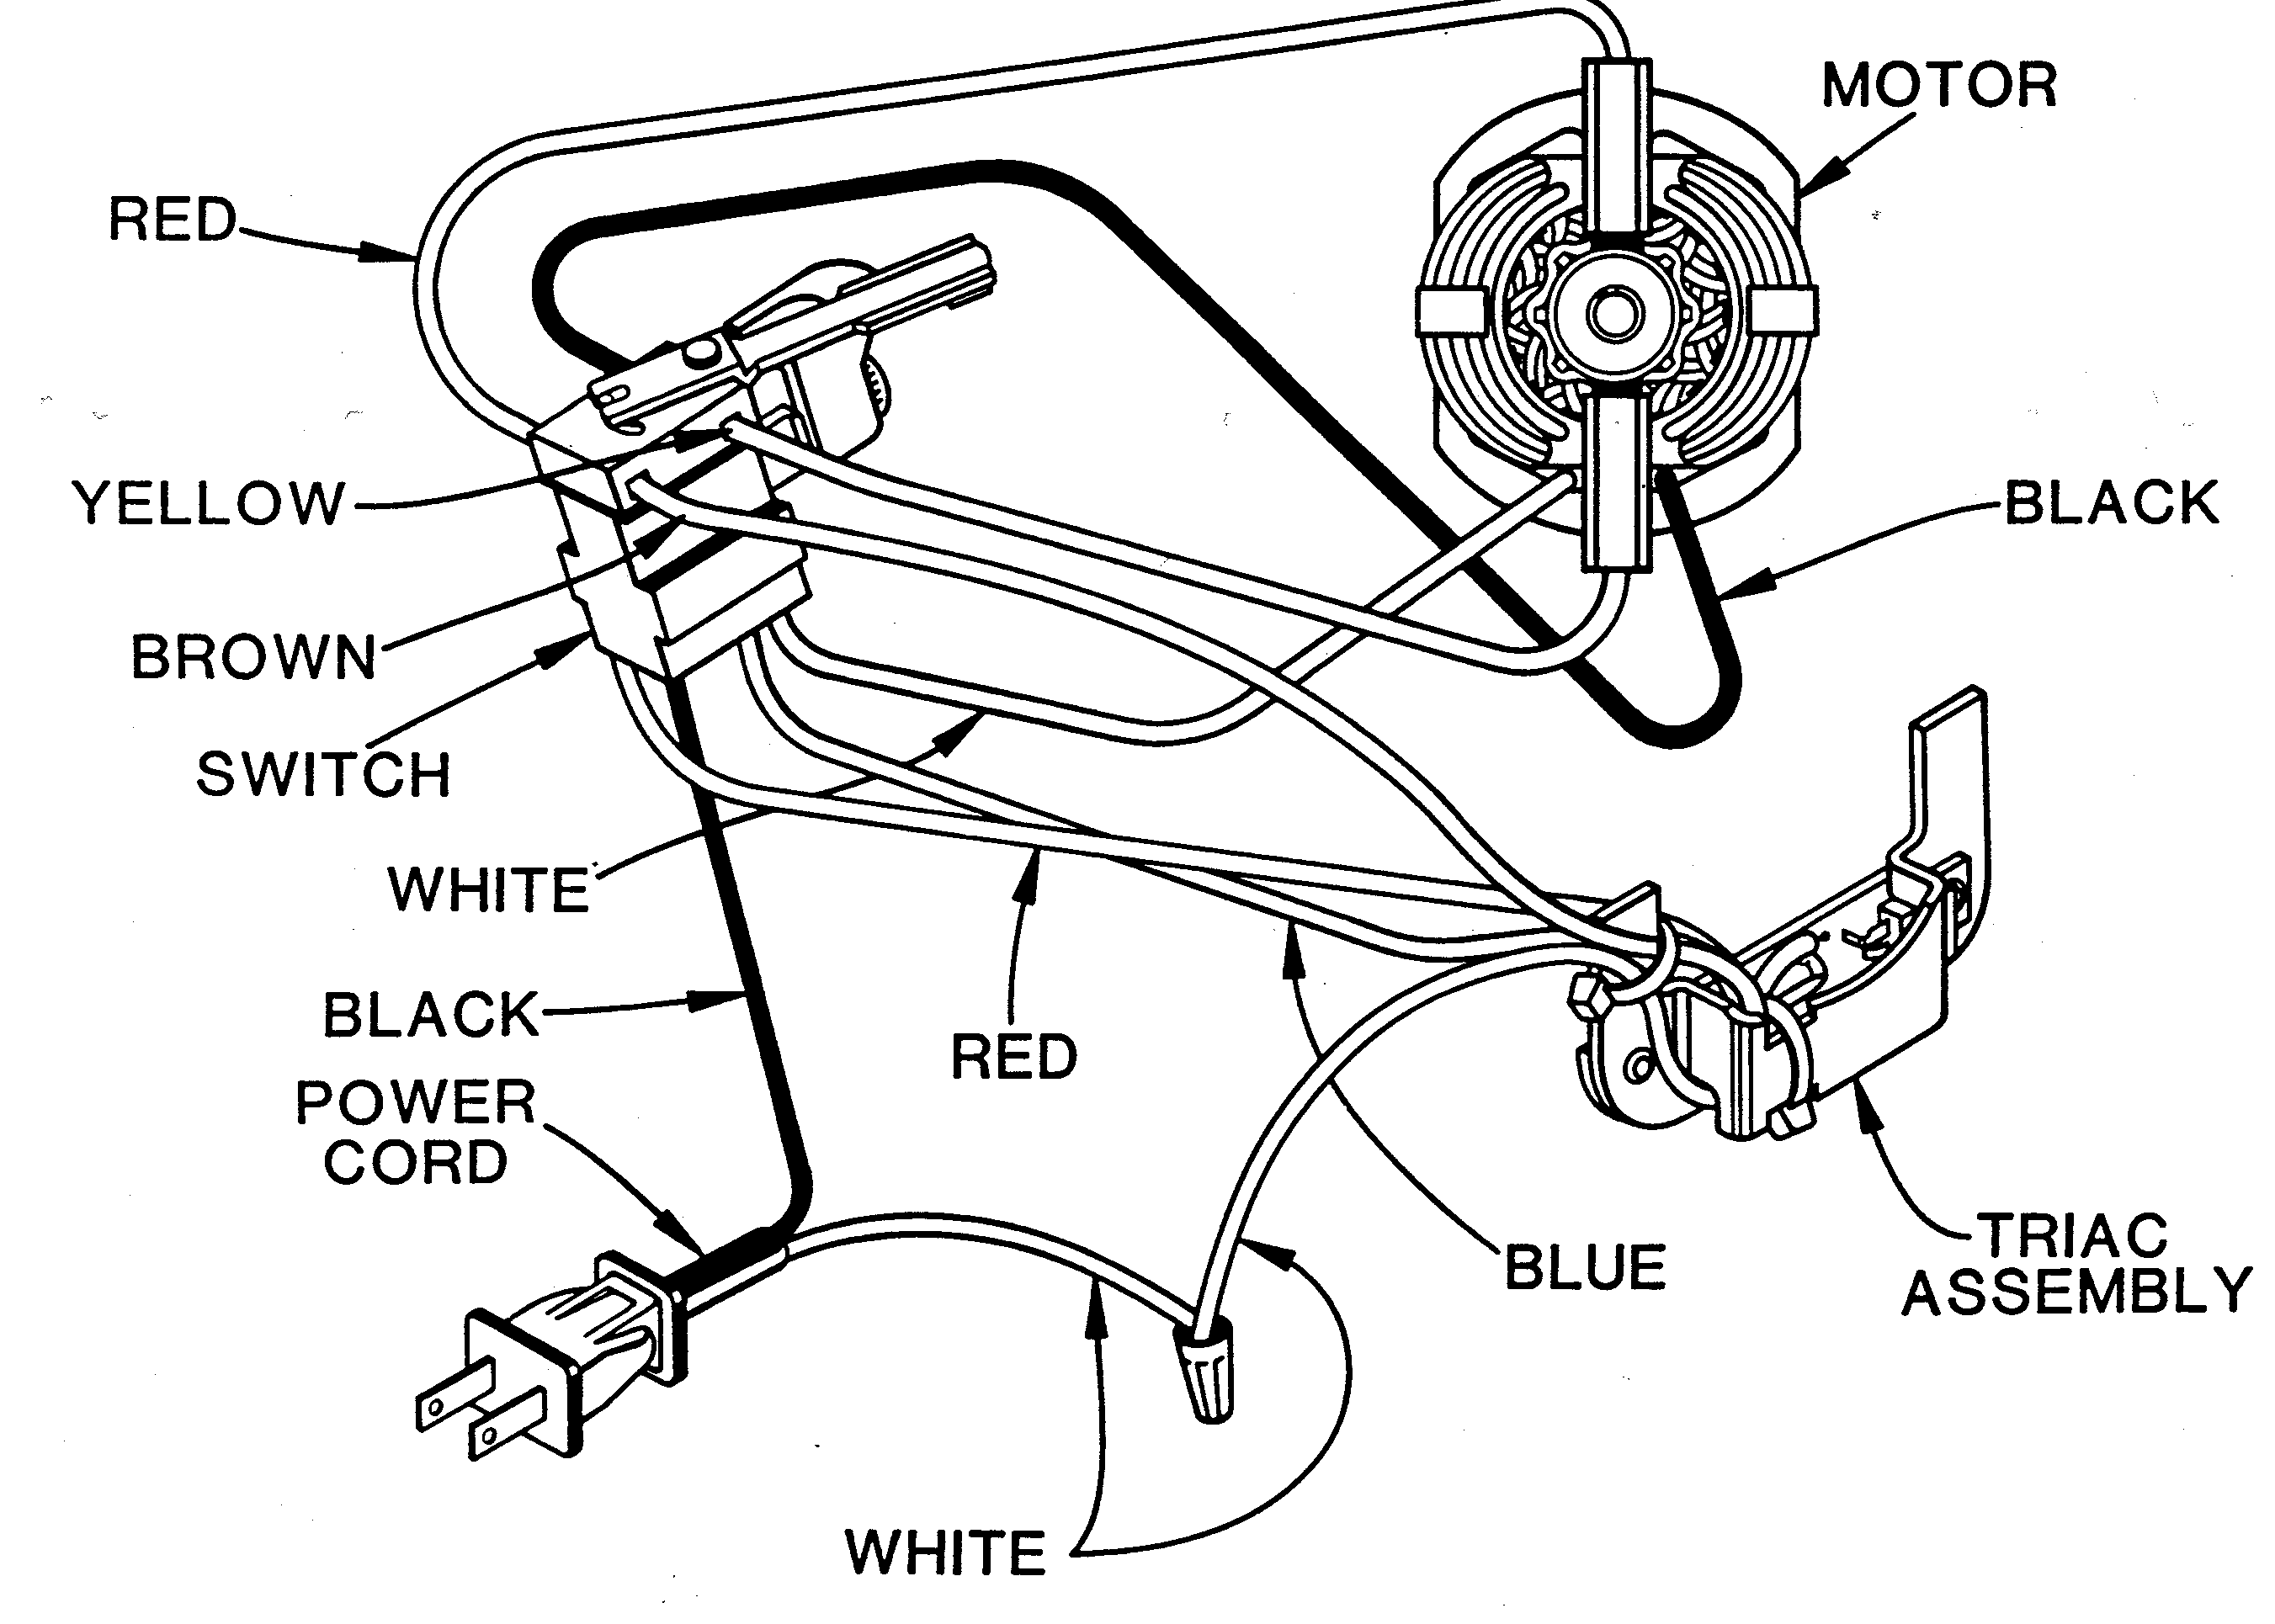 sony cdx s2000 wiring diagram